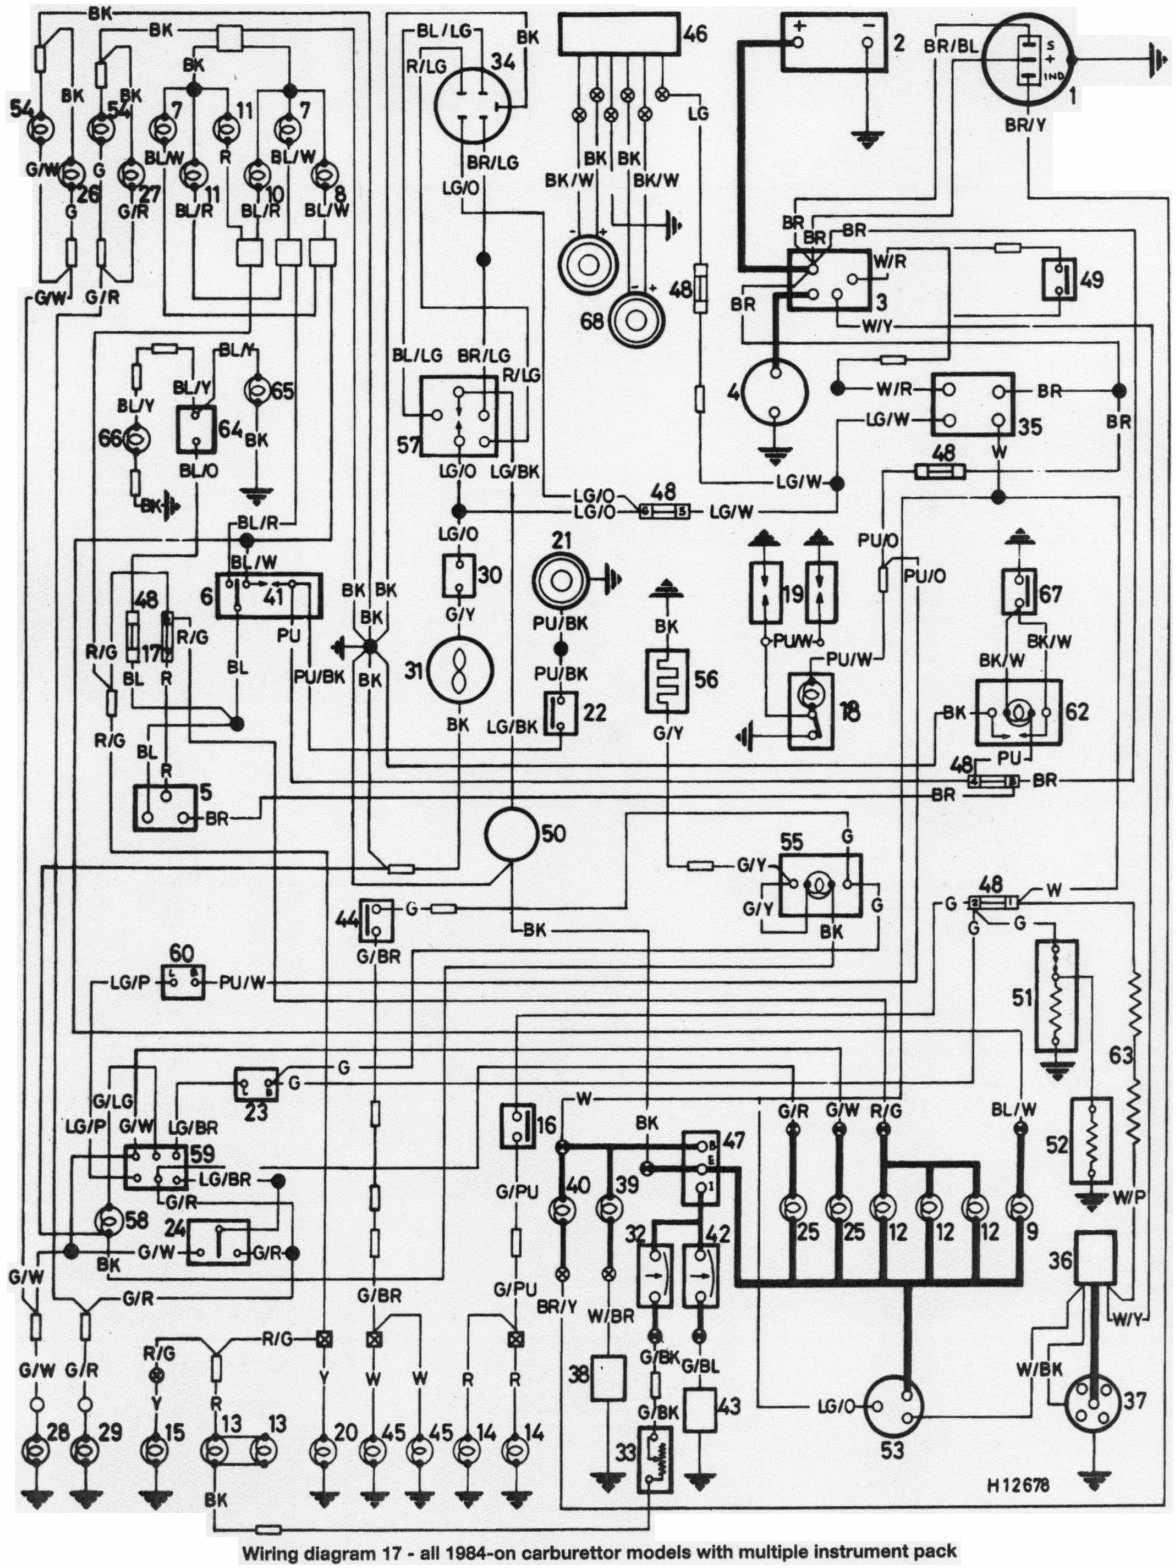 hight resolution of austin healey sprite wiring diagram 35 wiring diagram images austin healey sprite body austin healey frogeye